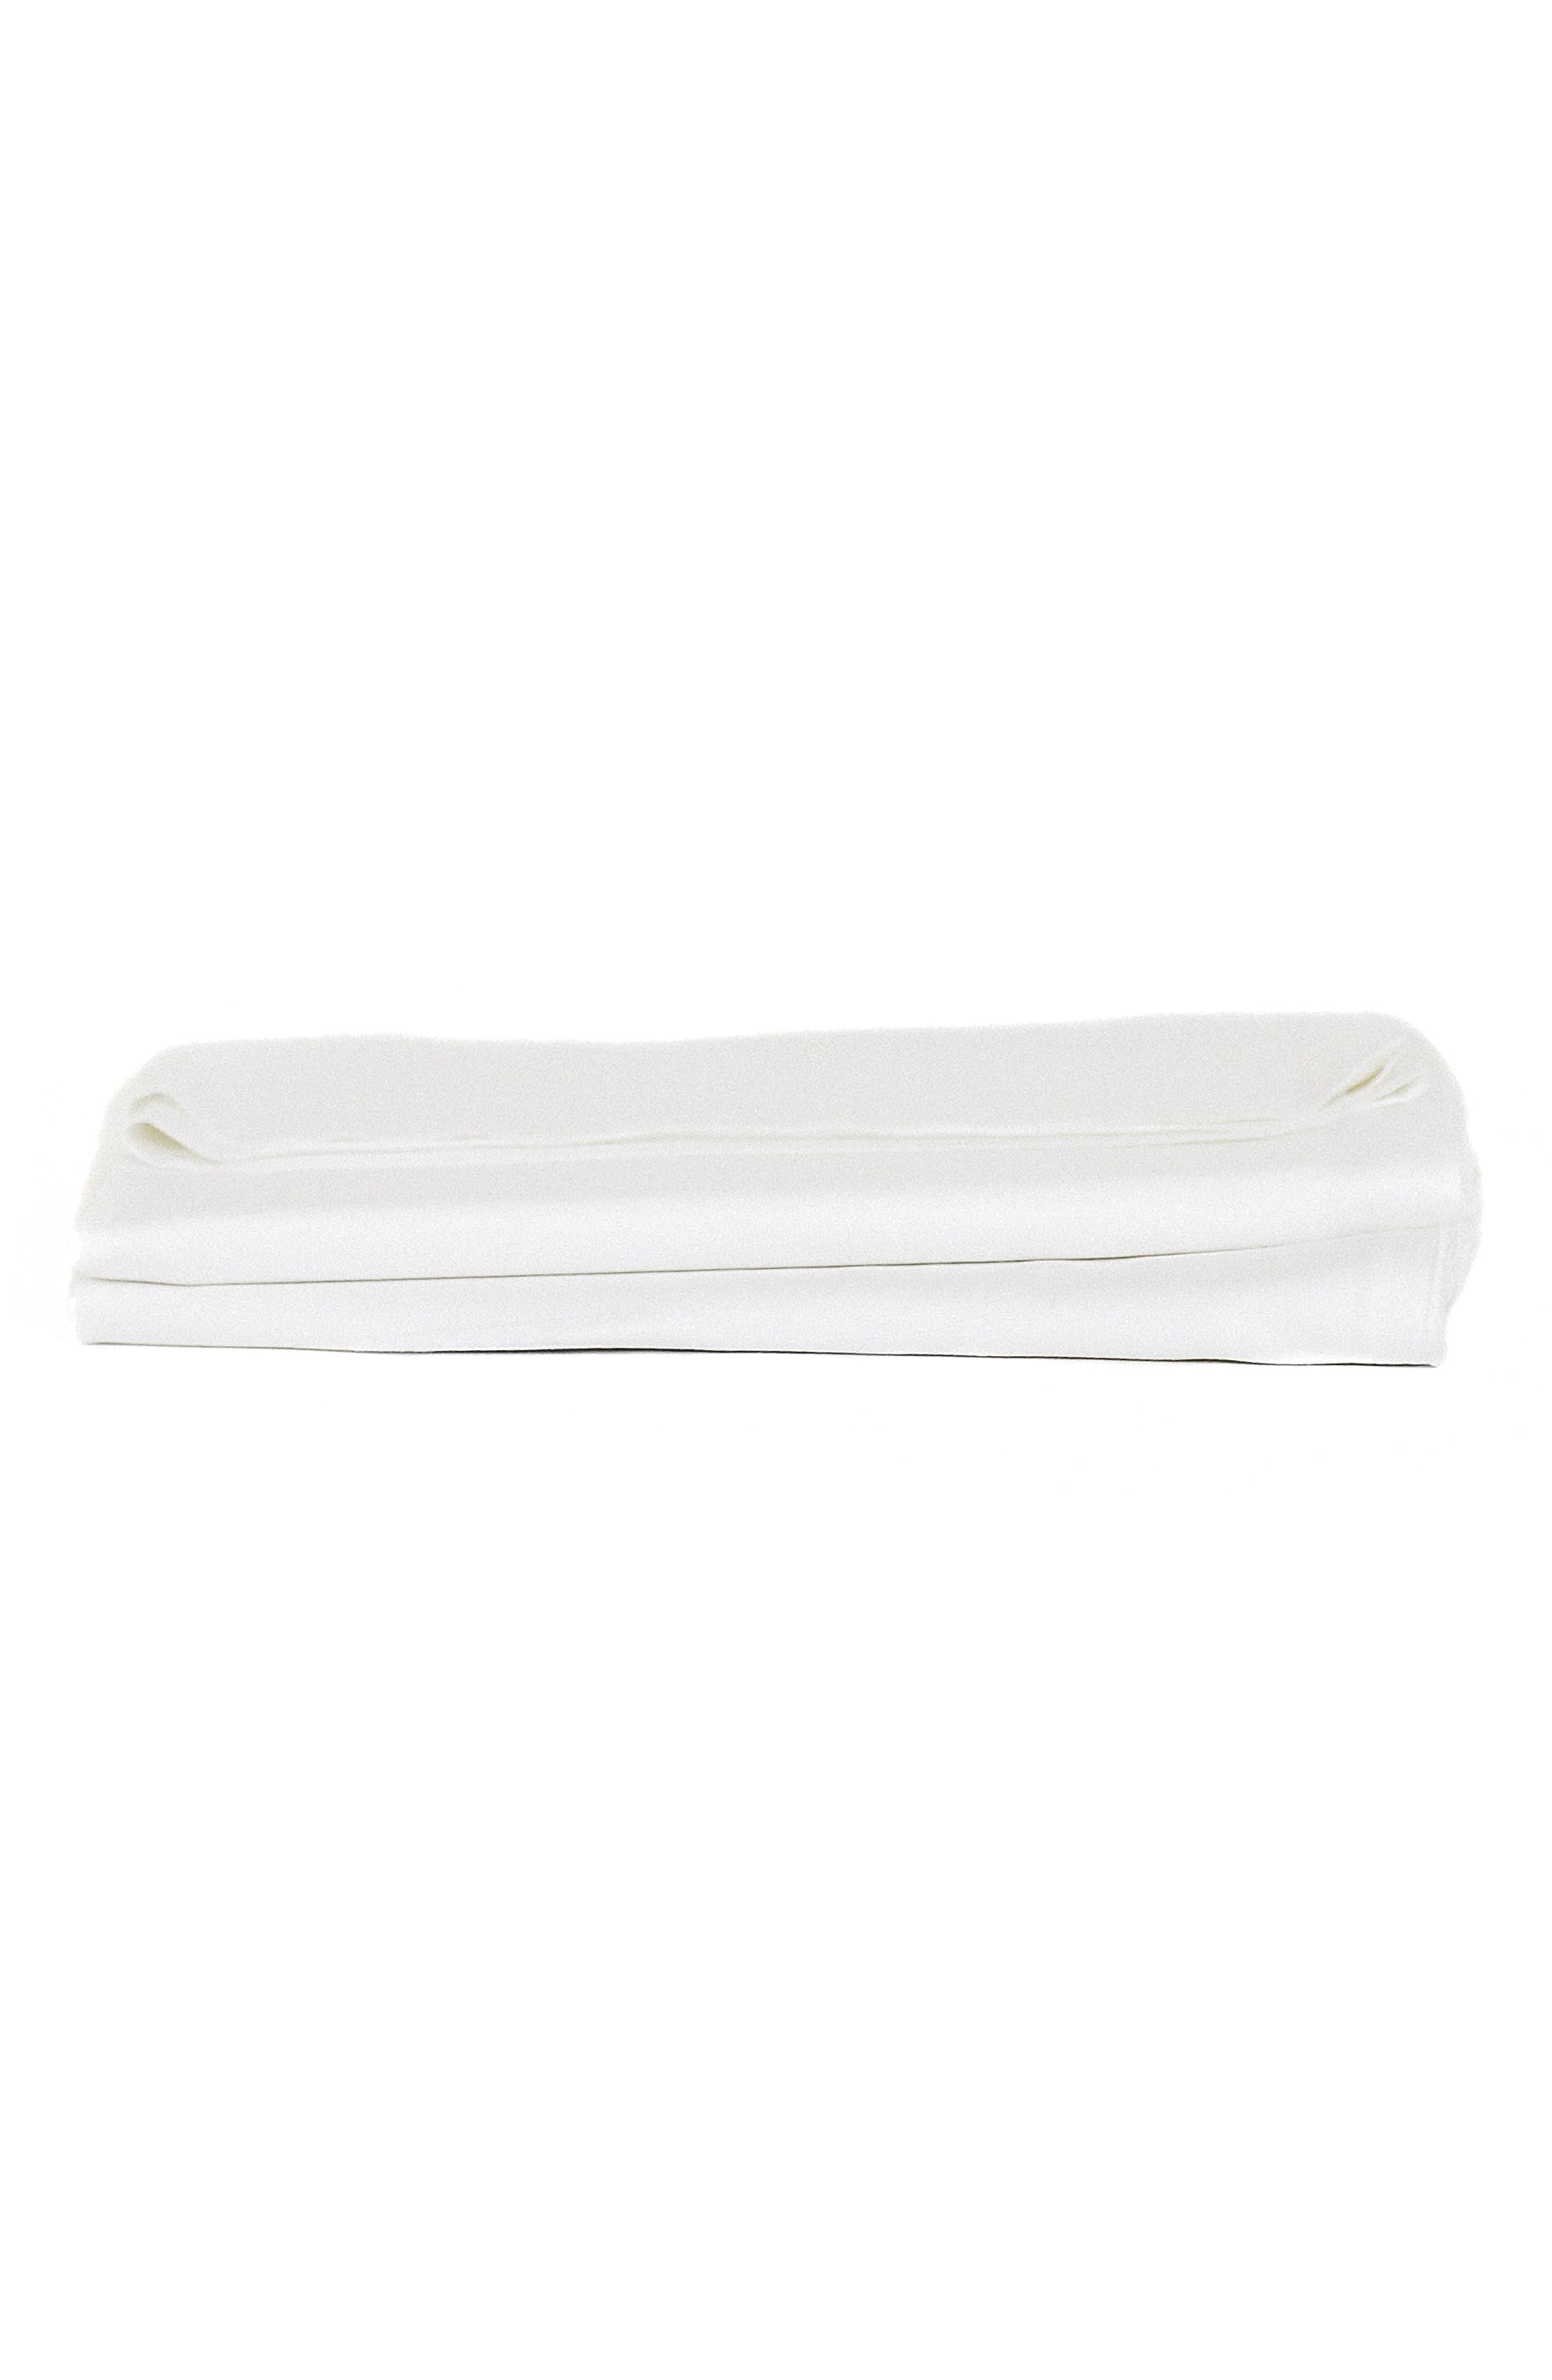 Main Image - Cozy Earth Pillowcase